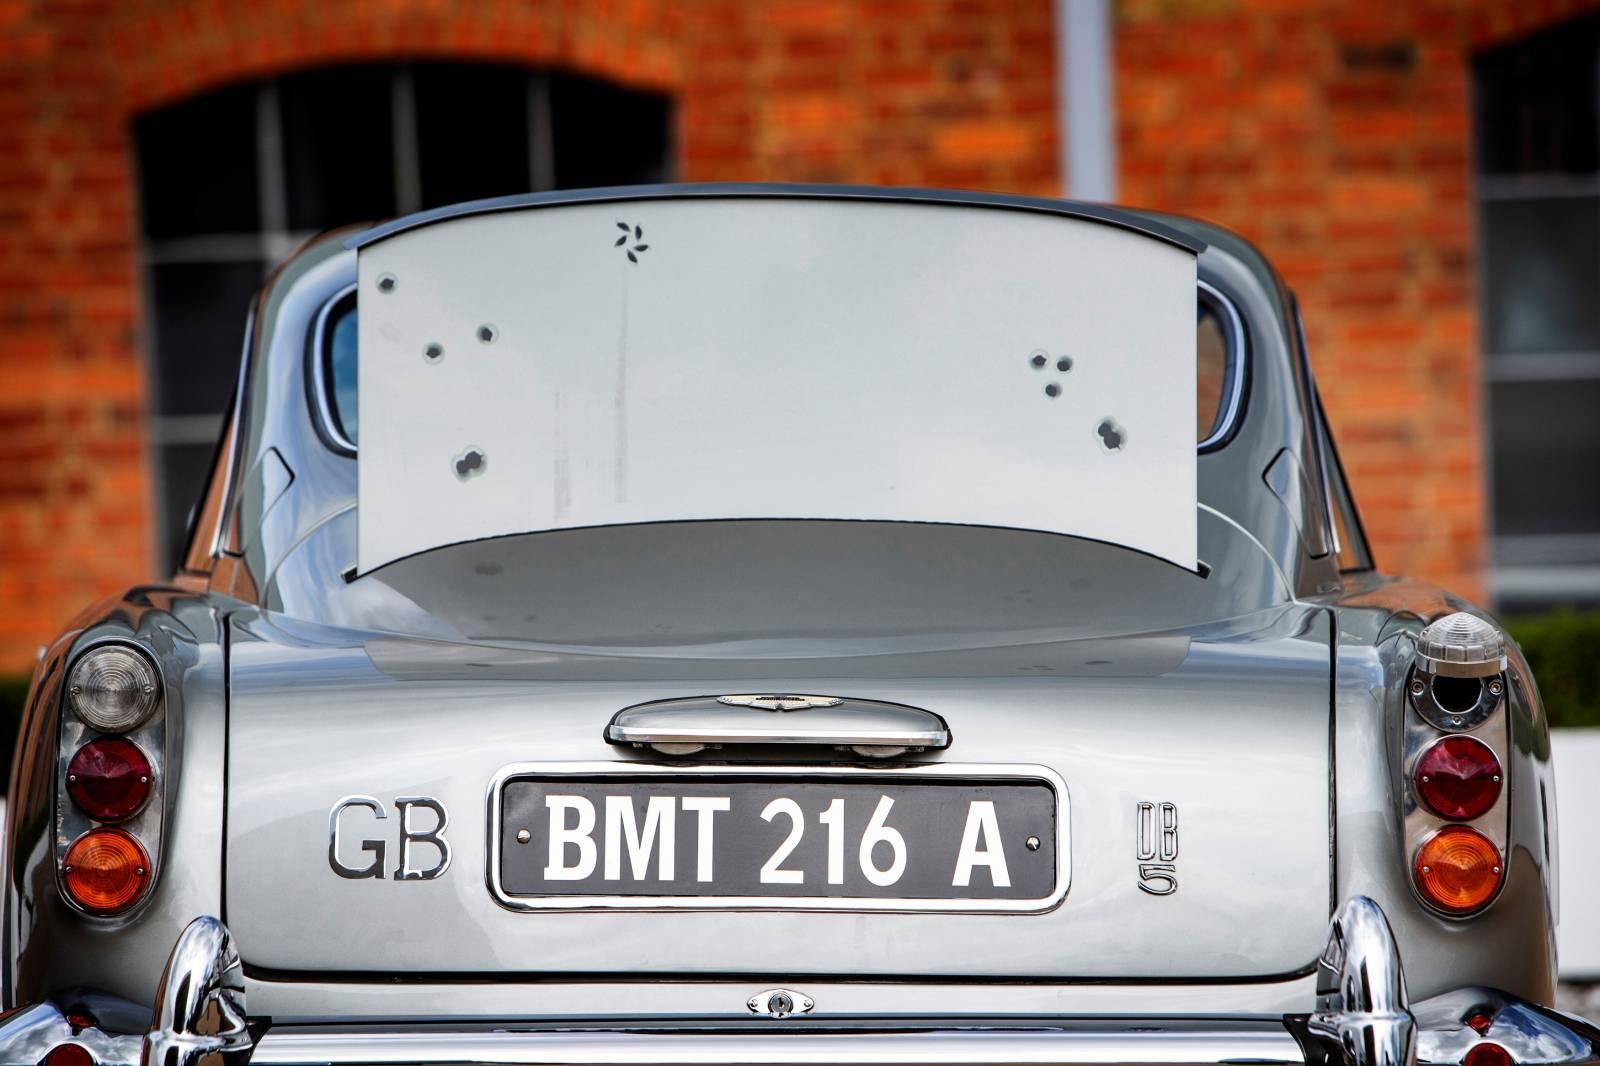 Handout photo of the detail of an original Aston Martin DB5 James Bond car